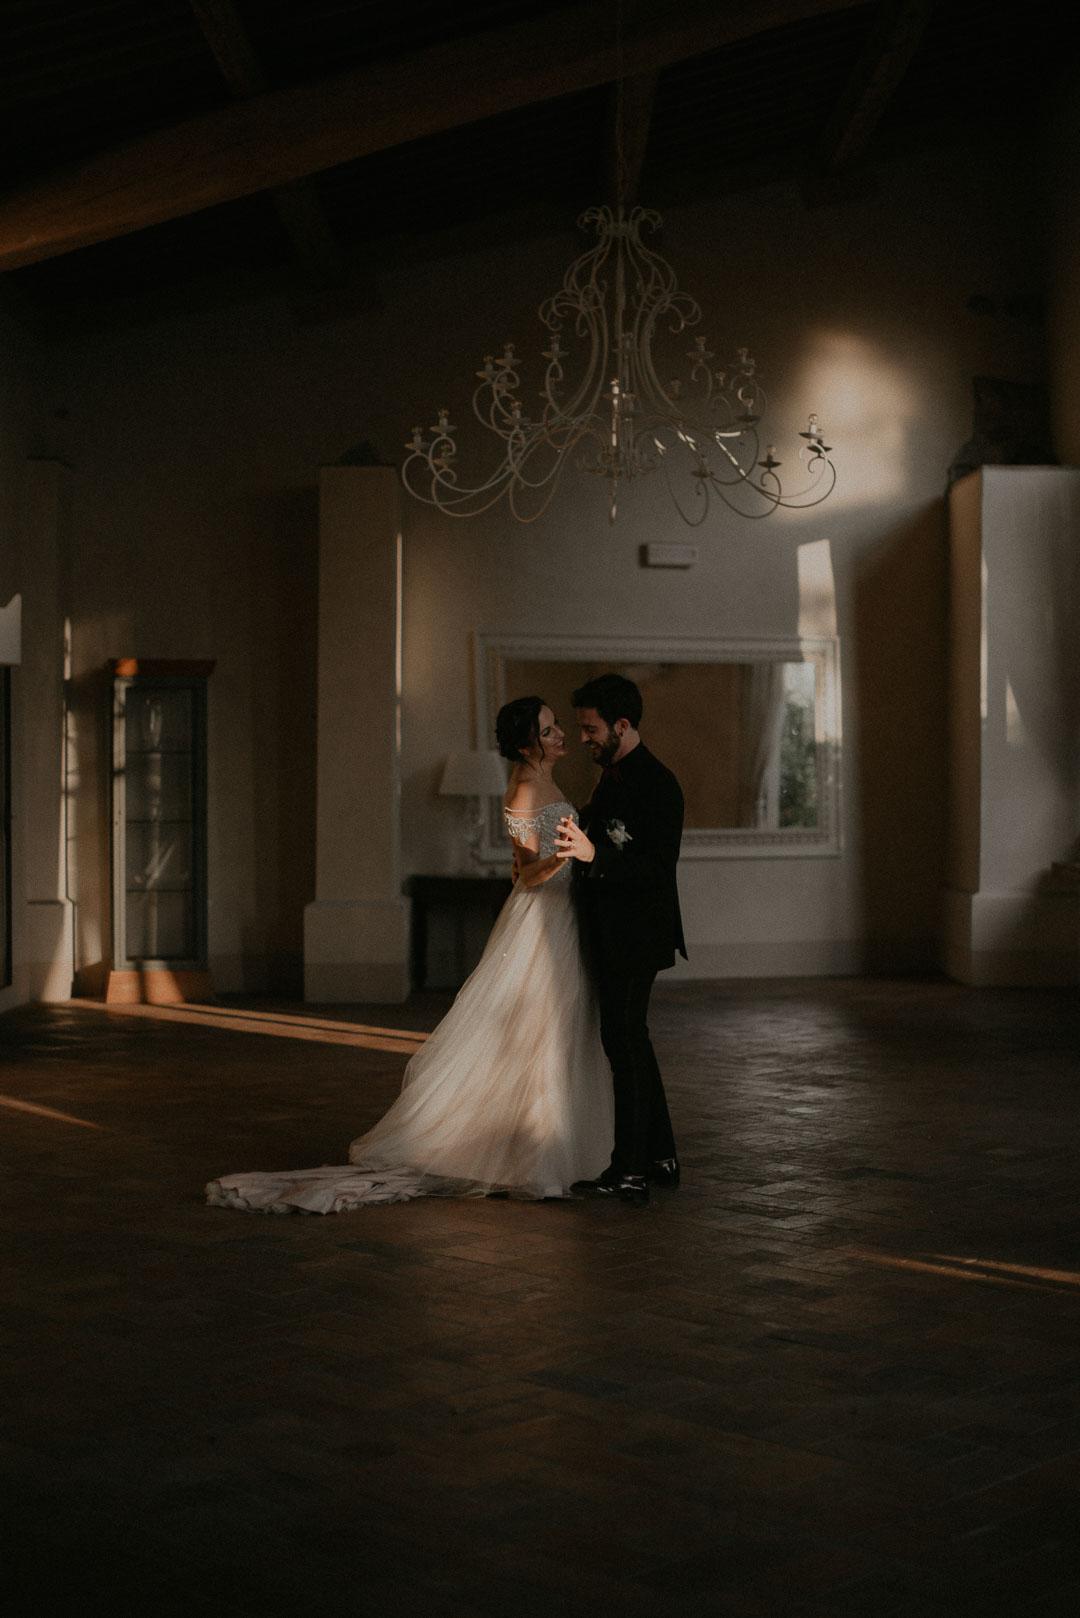 wedding-photographer-destination-fineart-bespoke-reportage-tuscany-villascorzi-vivianeizzo-spazio46-119